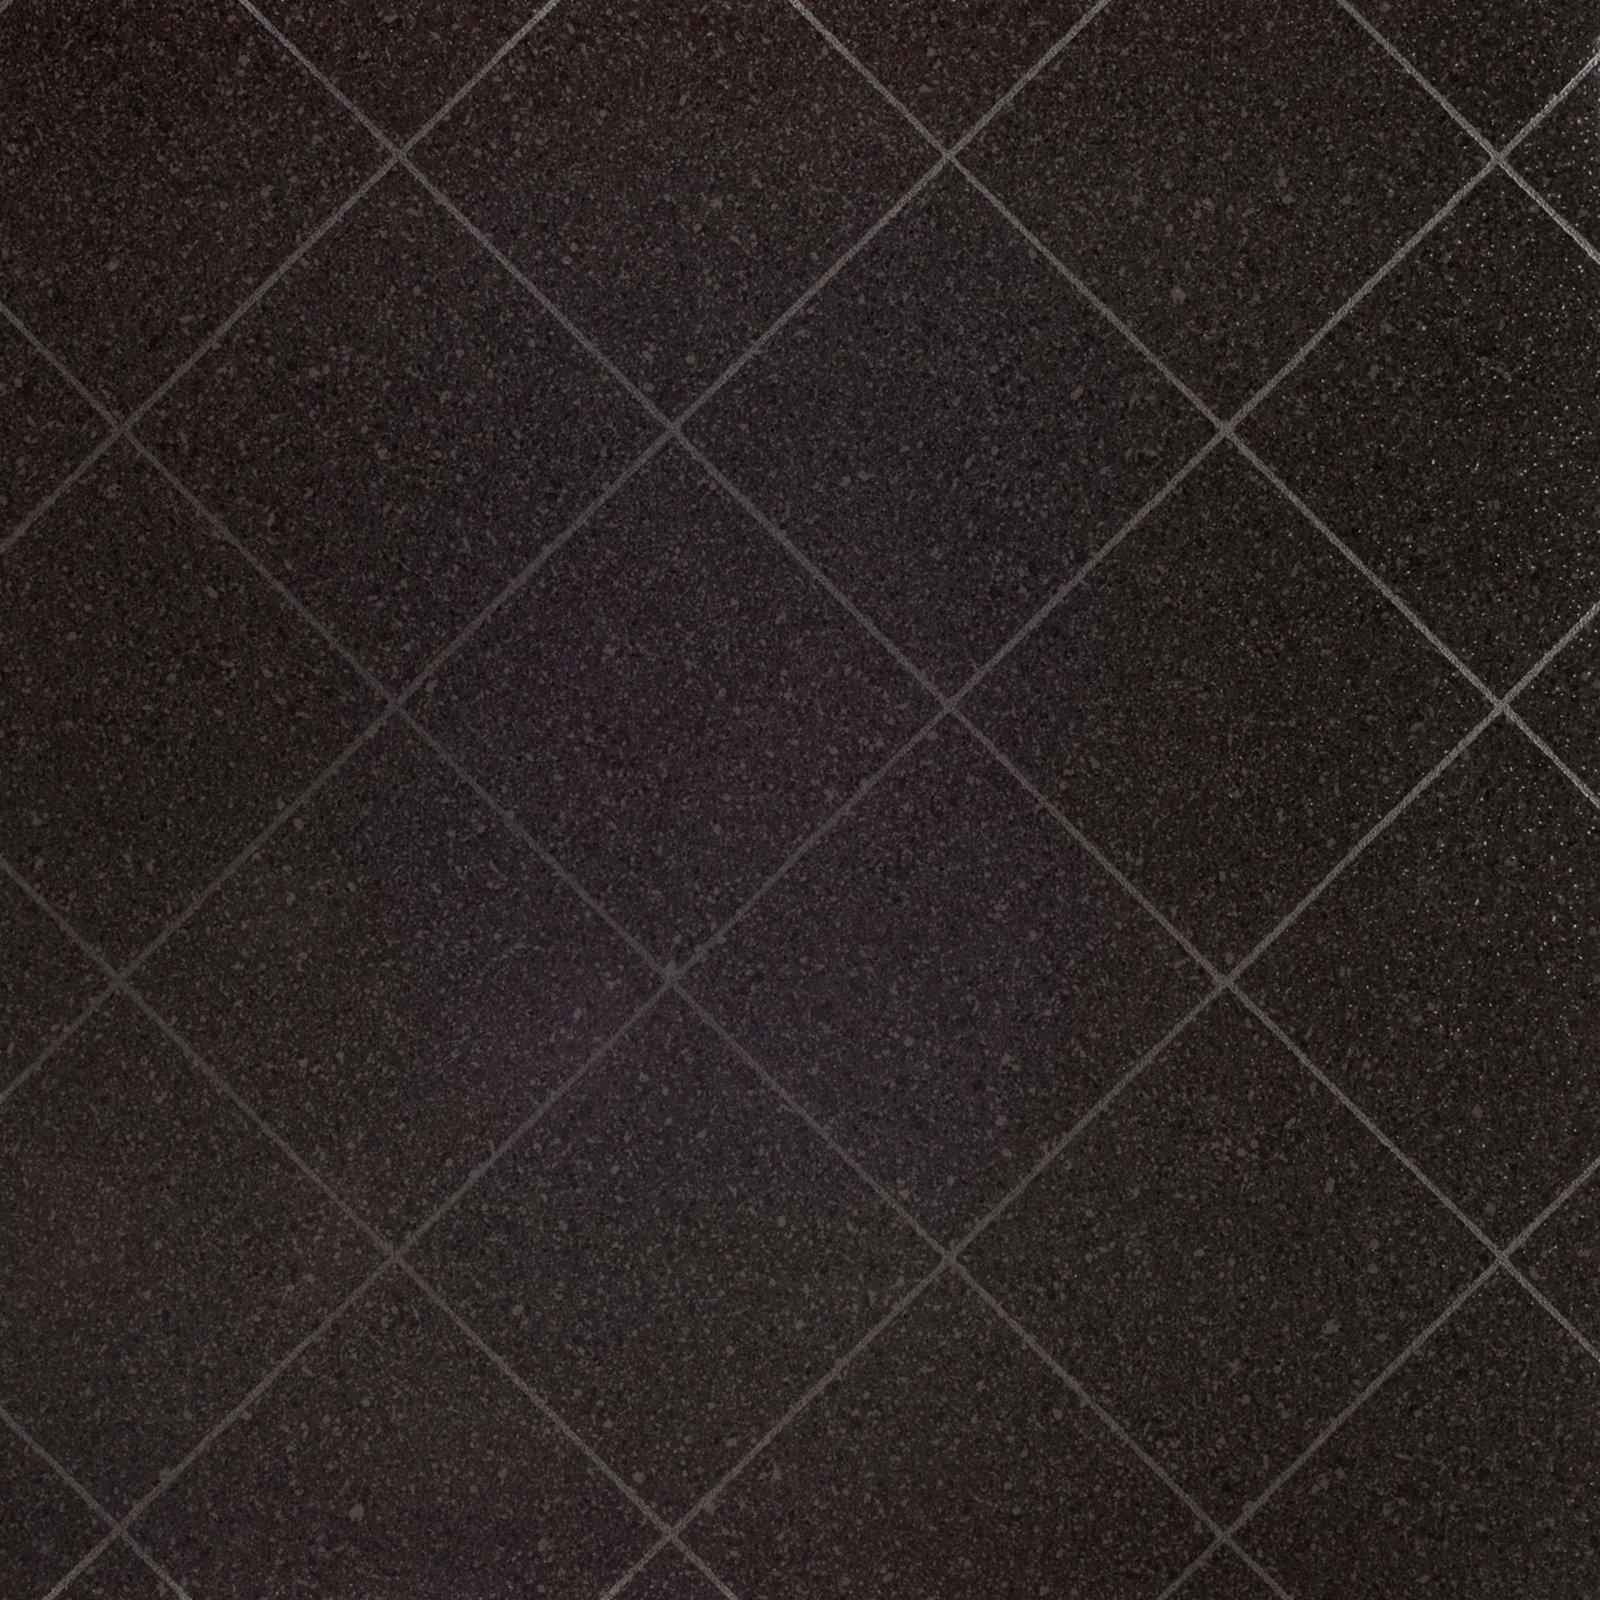 PVC-Bodenbelag - schwarz Hochglanz - Fliesenoptik - 4 Meter